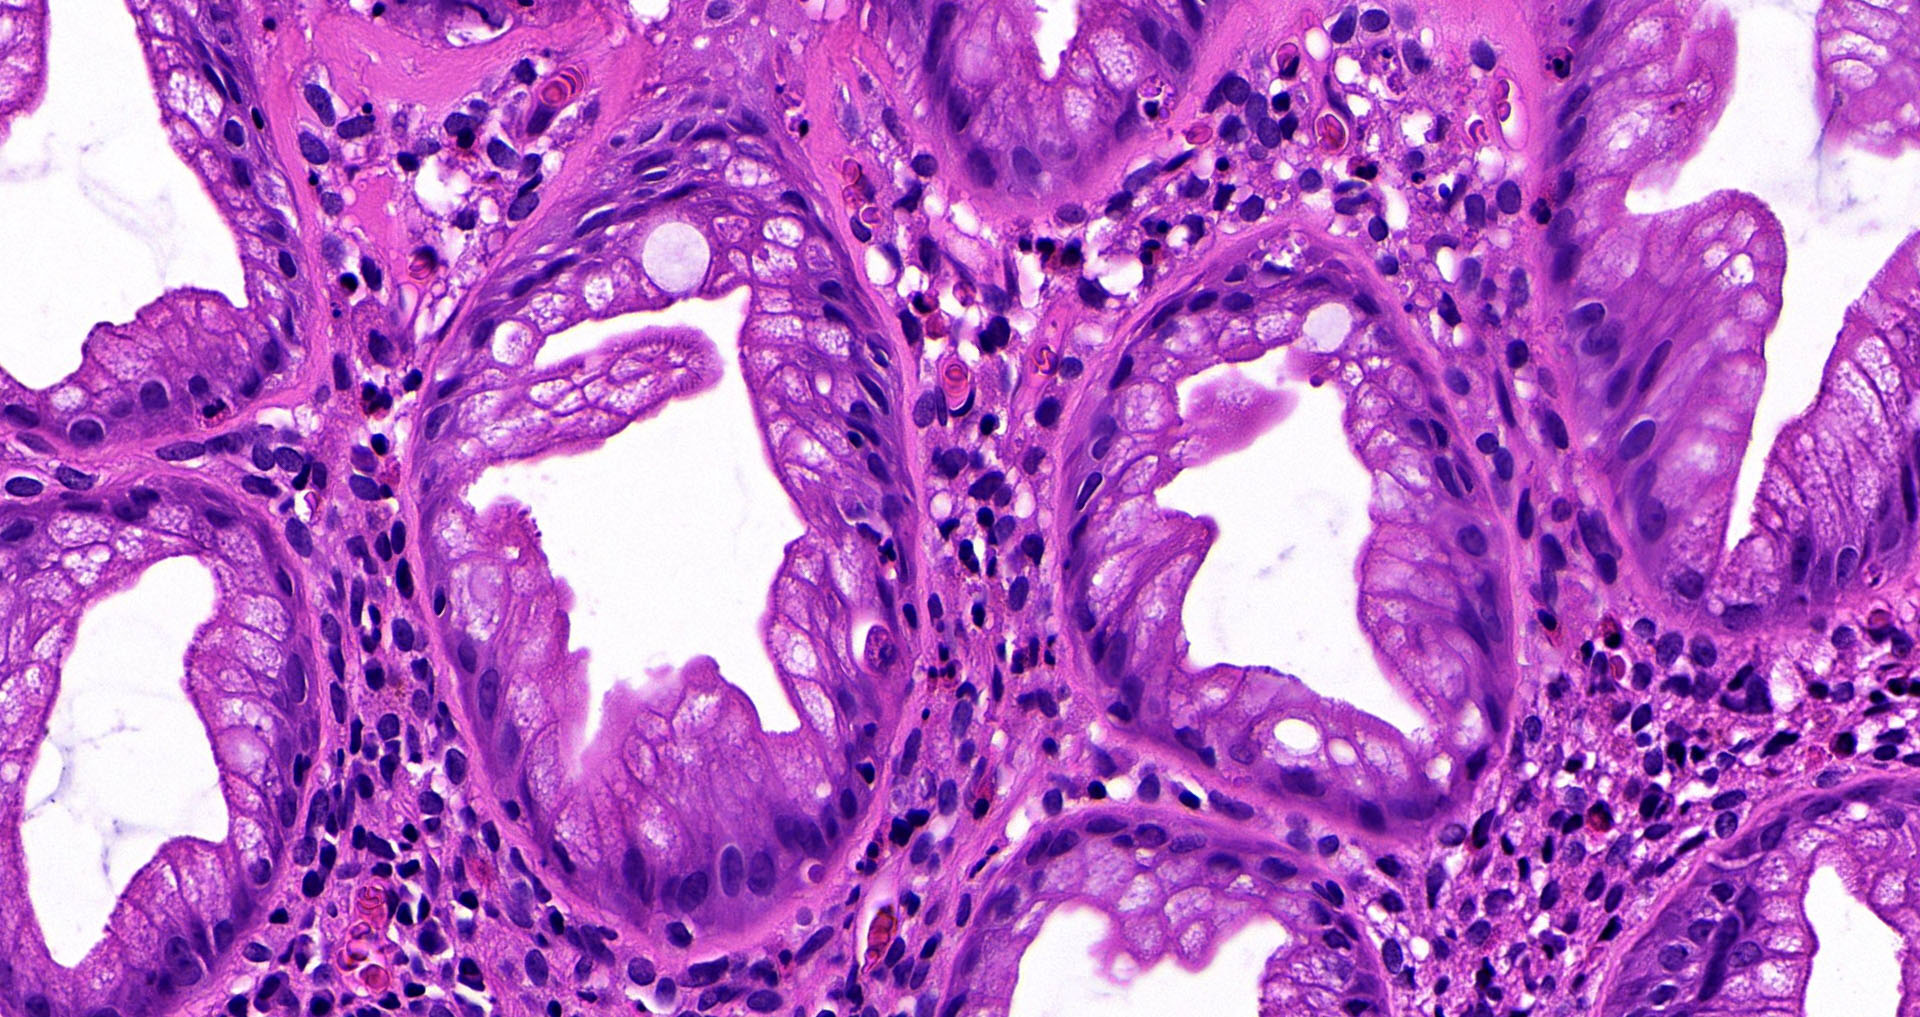 Sawtooth glands